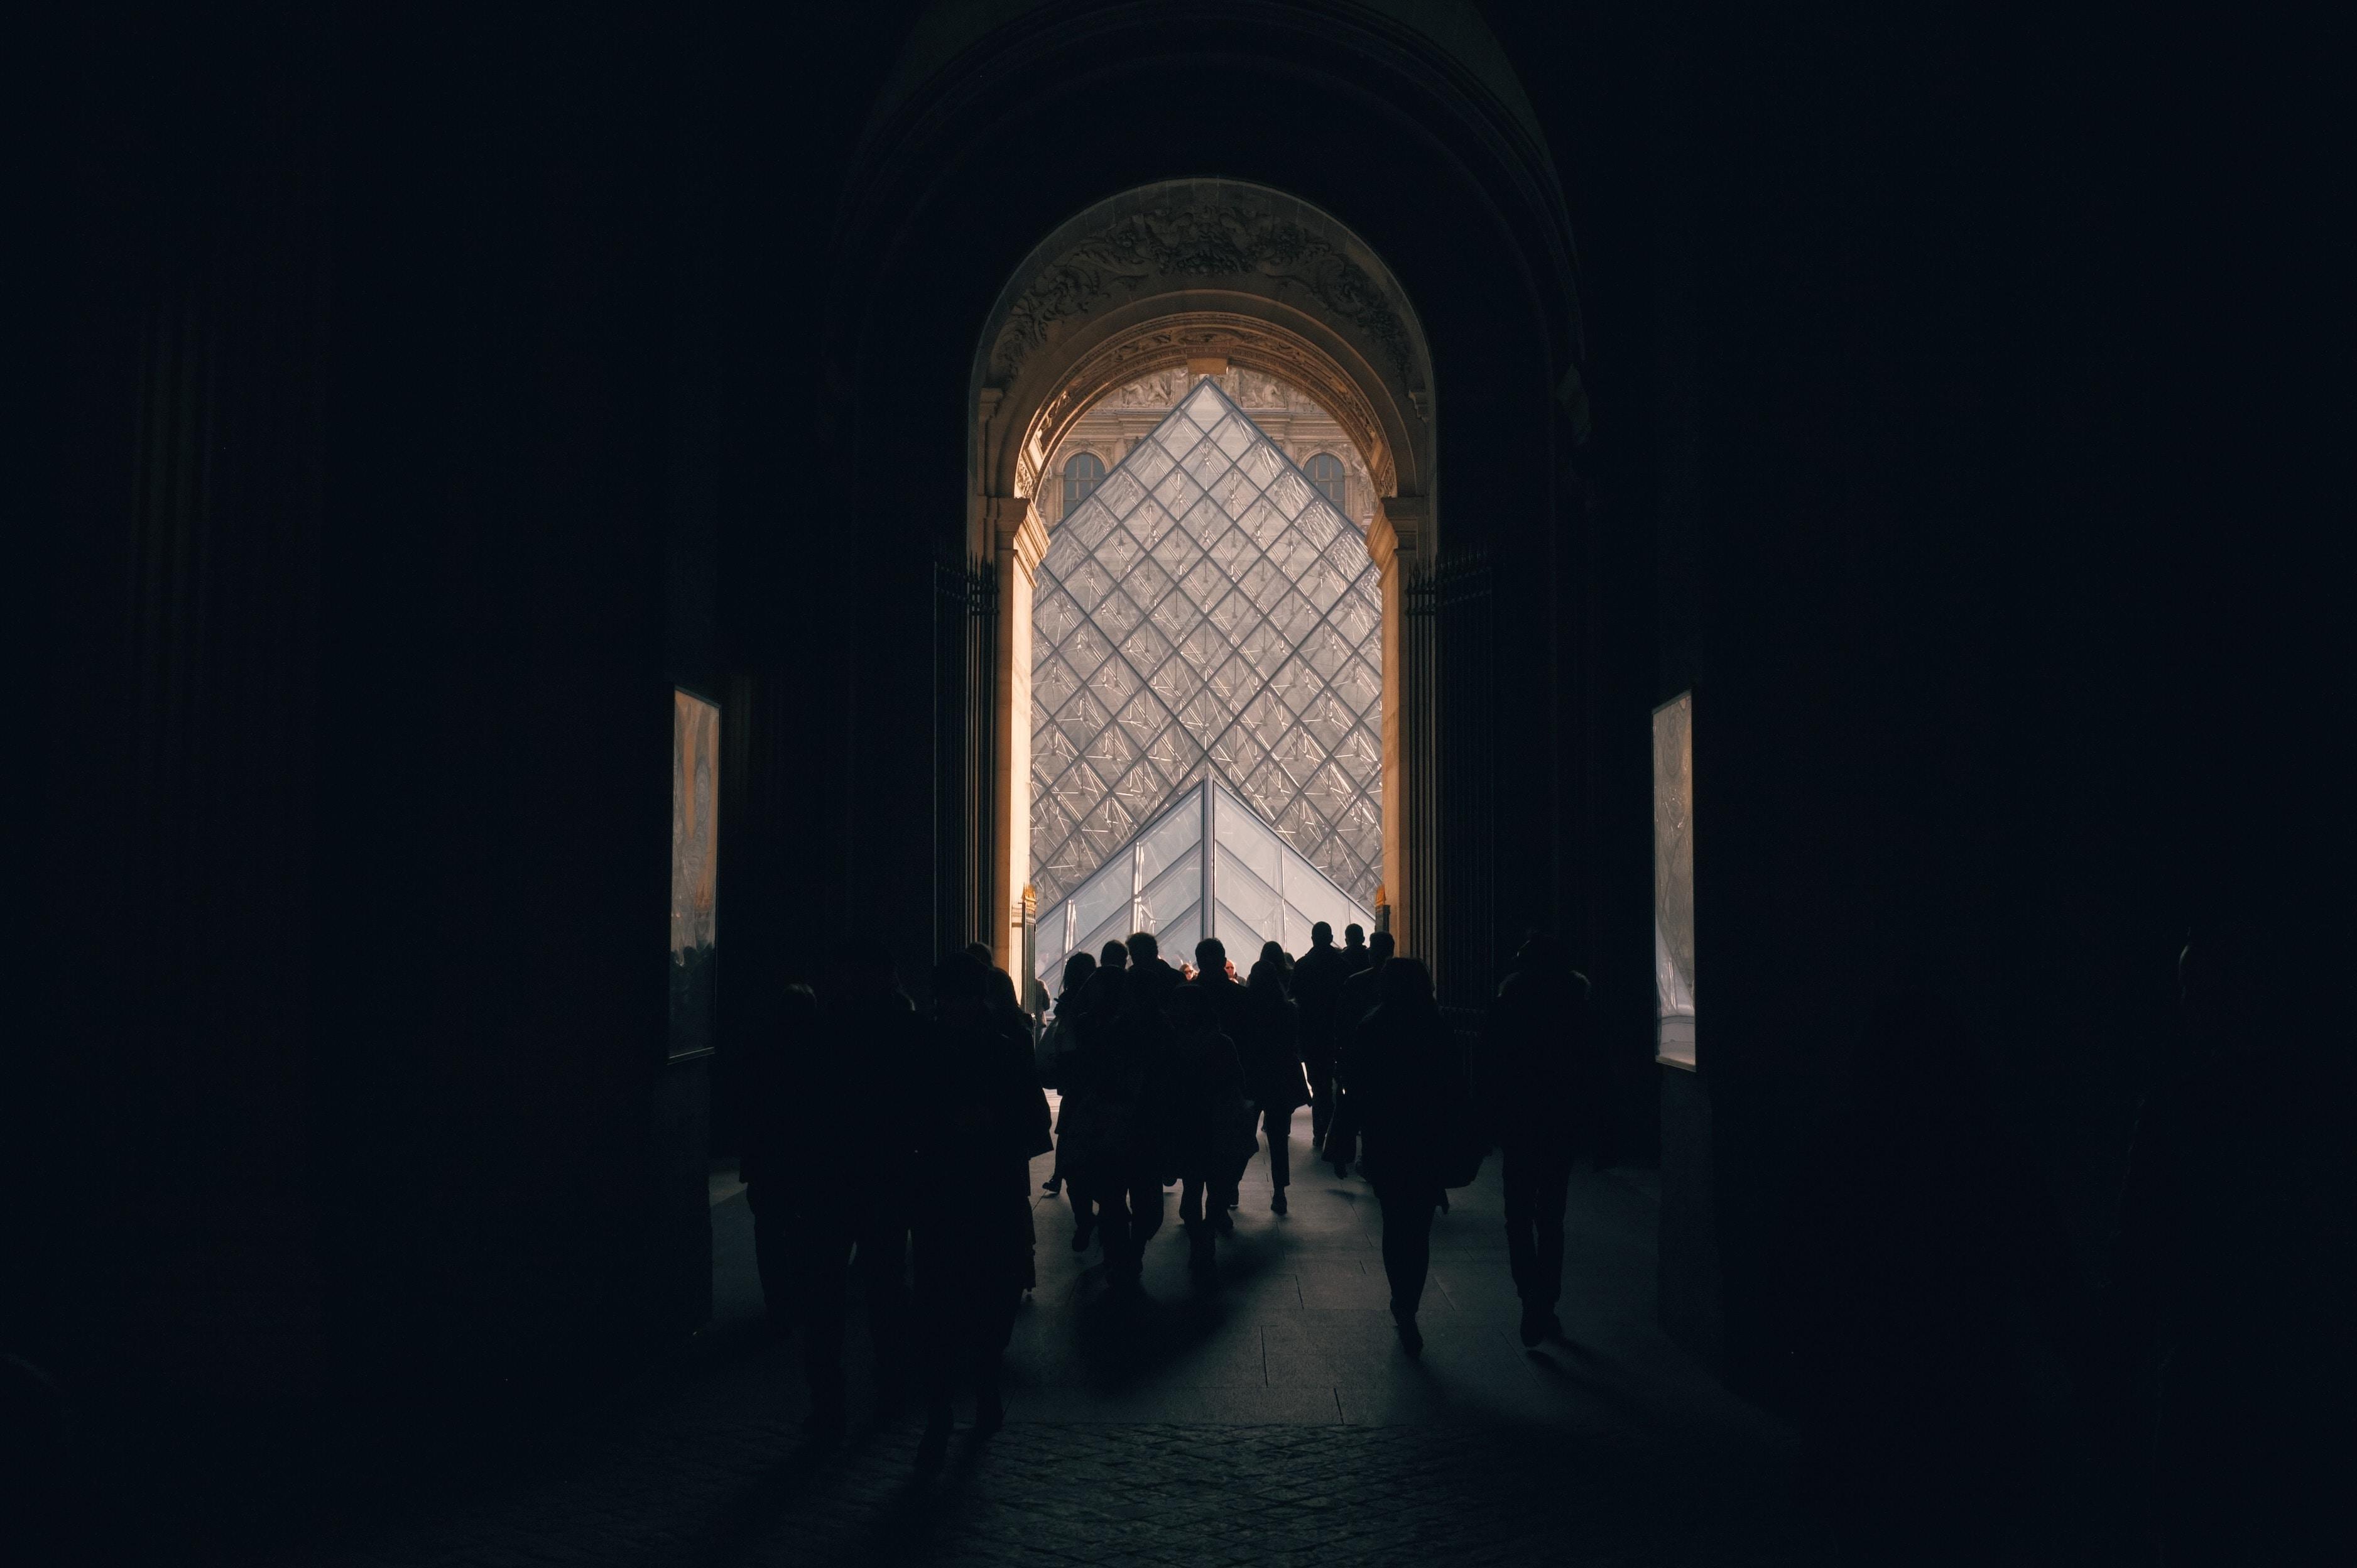 silhouette of people standing indoors